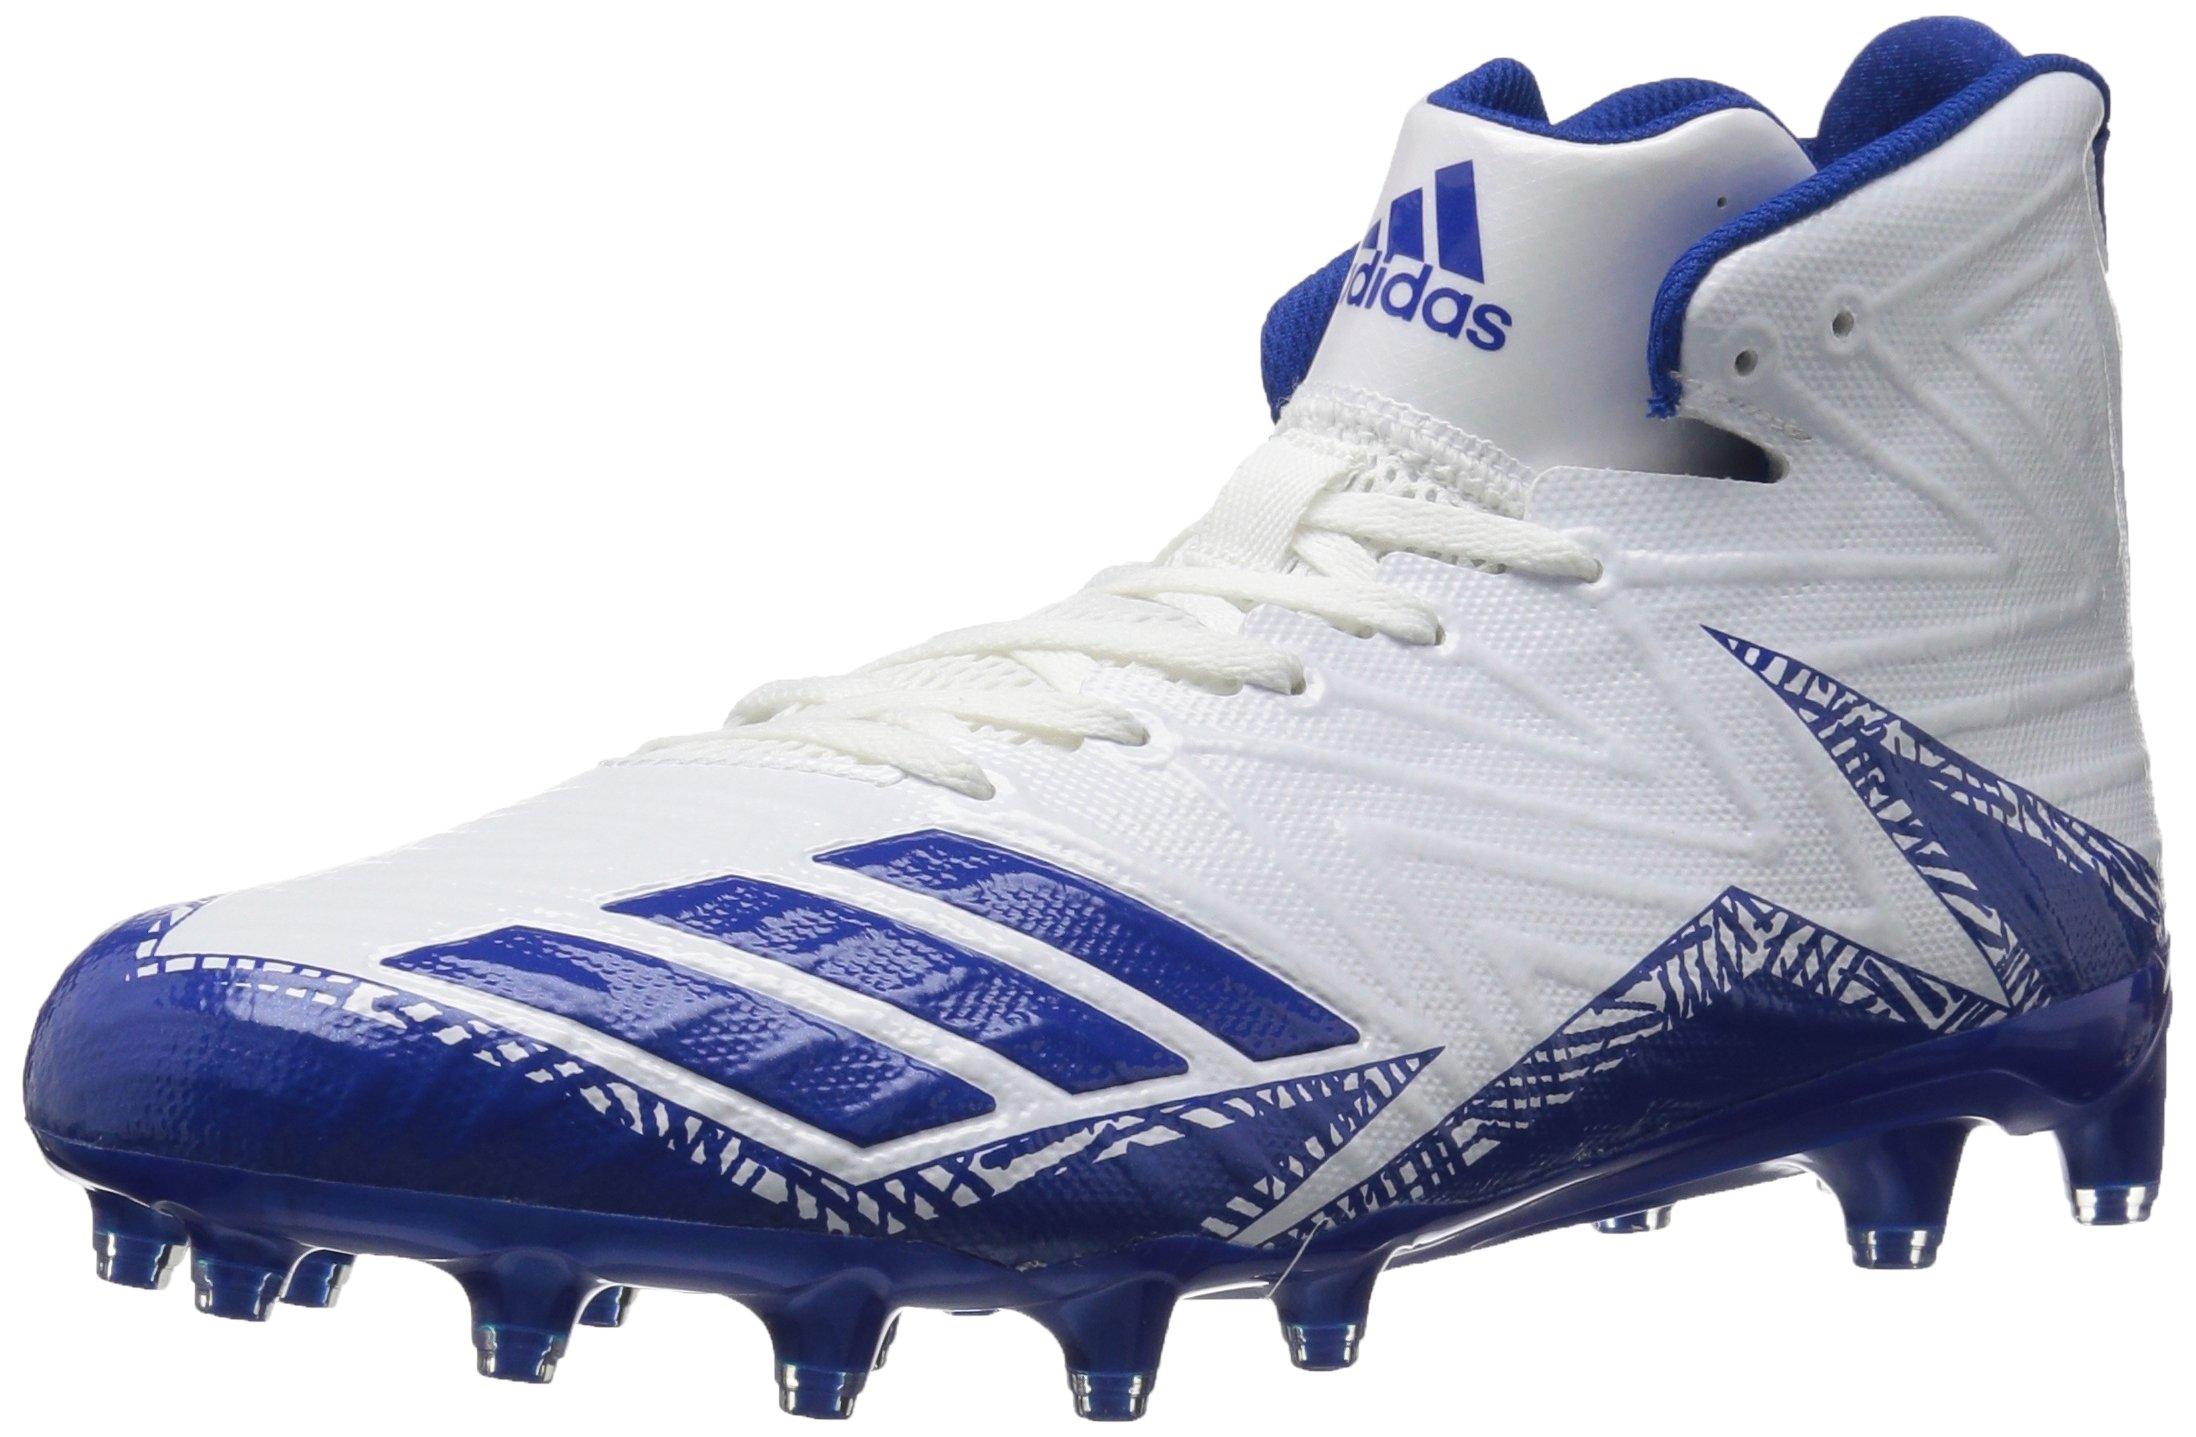 adidas Men's Freak X Carbon Mid Football Shoe, White/Collegiate Royal/Collegiate Royal, 7.5 Medium US